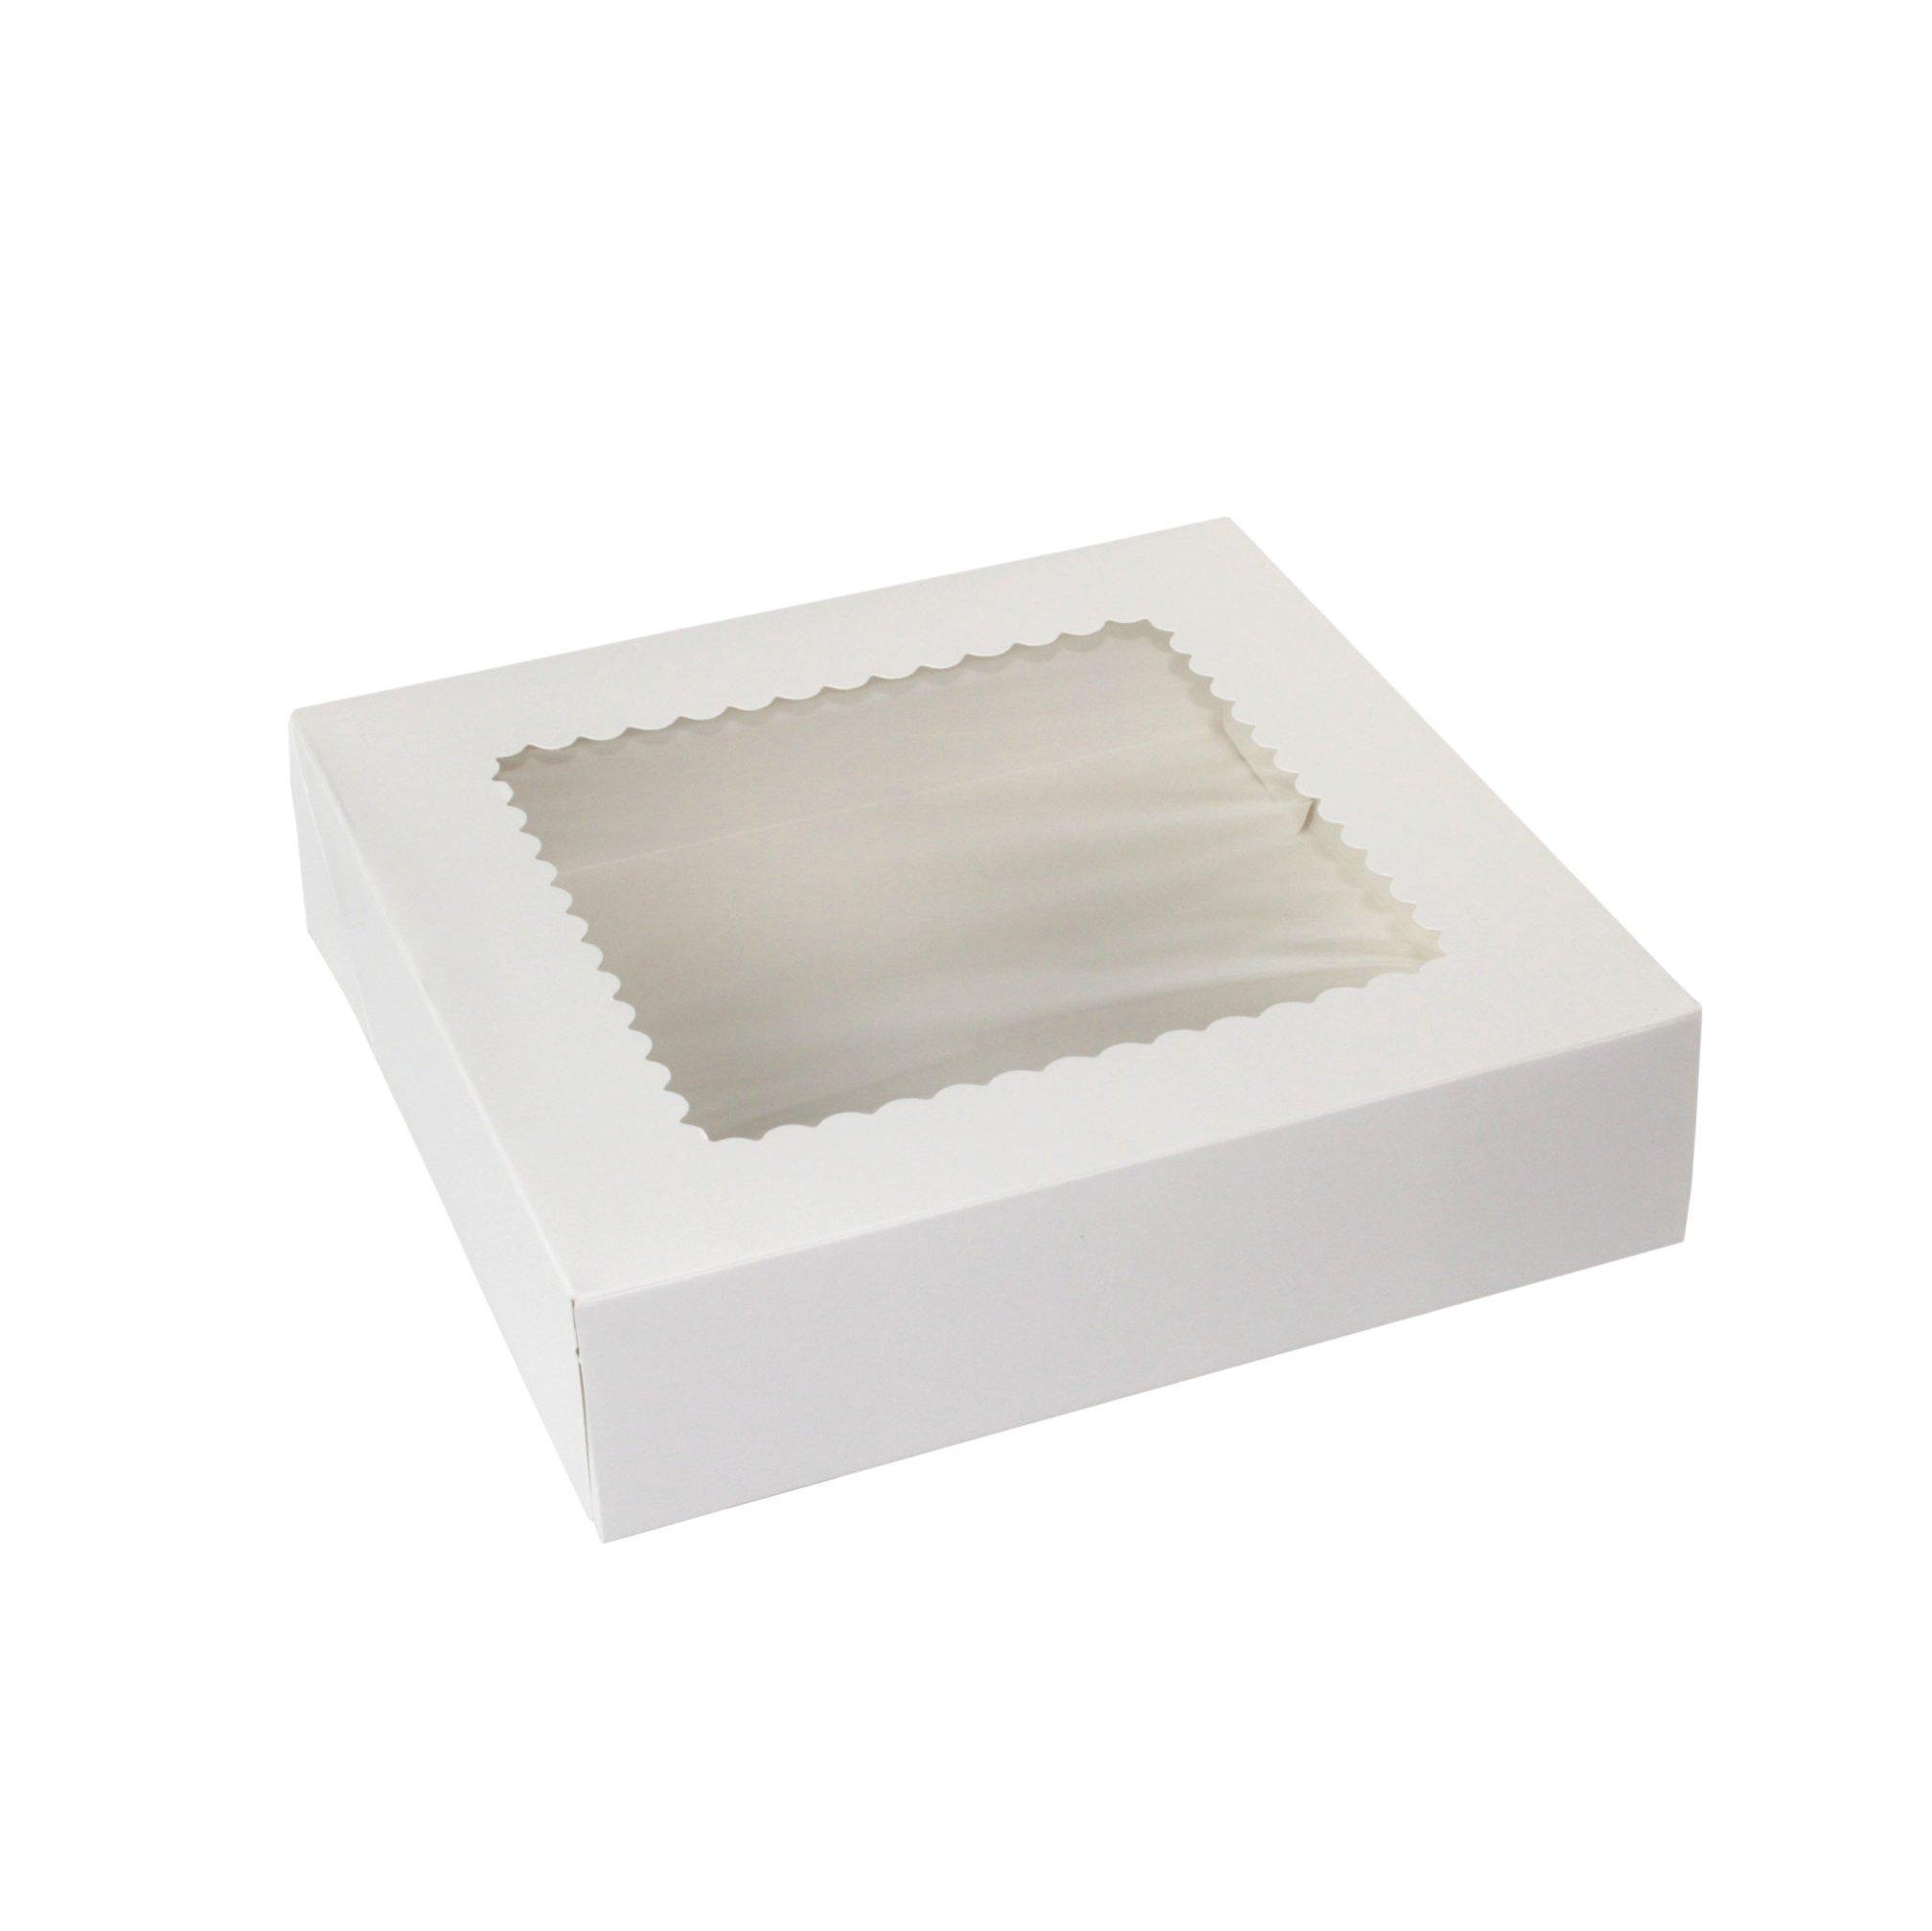 Boxit 10x10x2.5 White SBS Automatic Window Box, 4-Corner Beers 10102AW-126 - 150ct